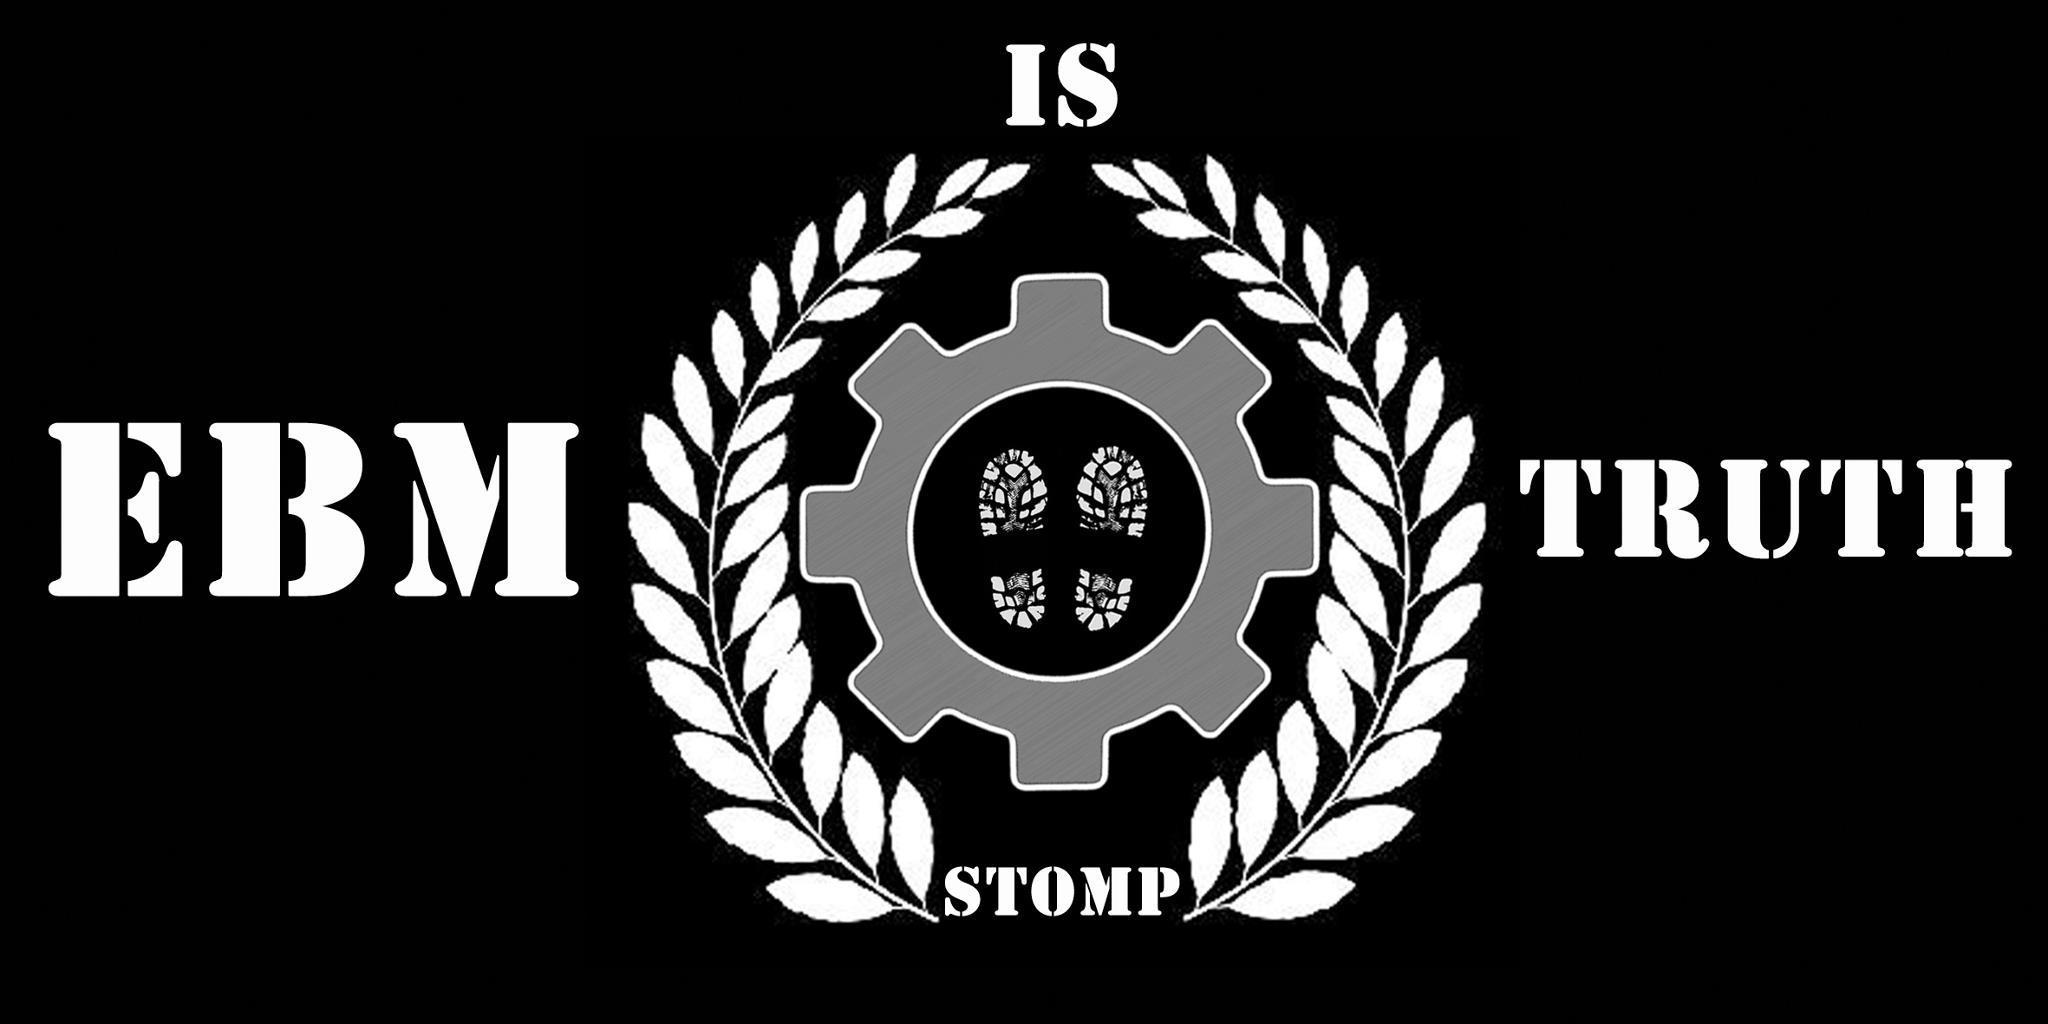 EBM Stomp / Scanner